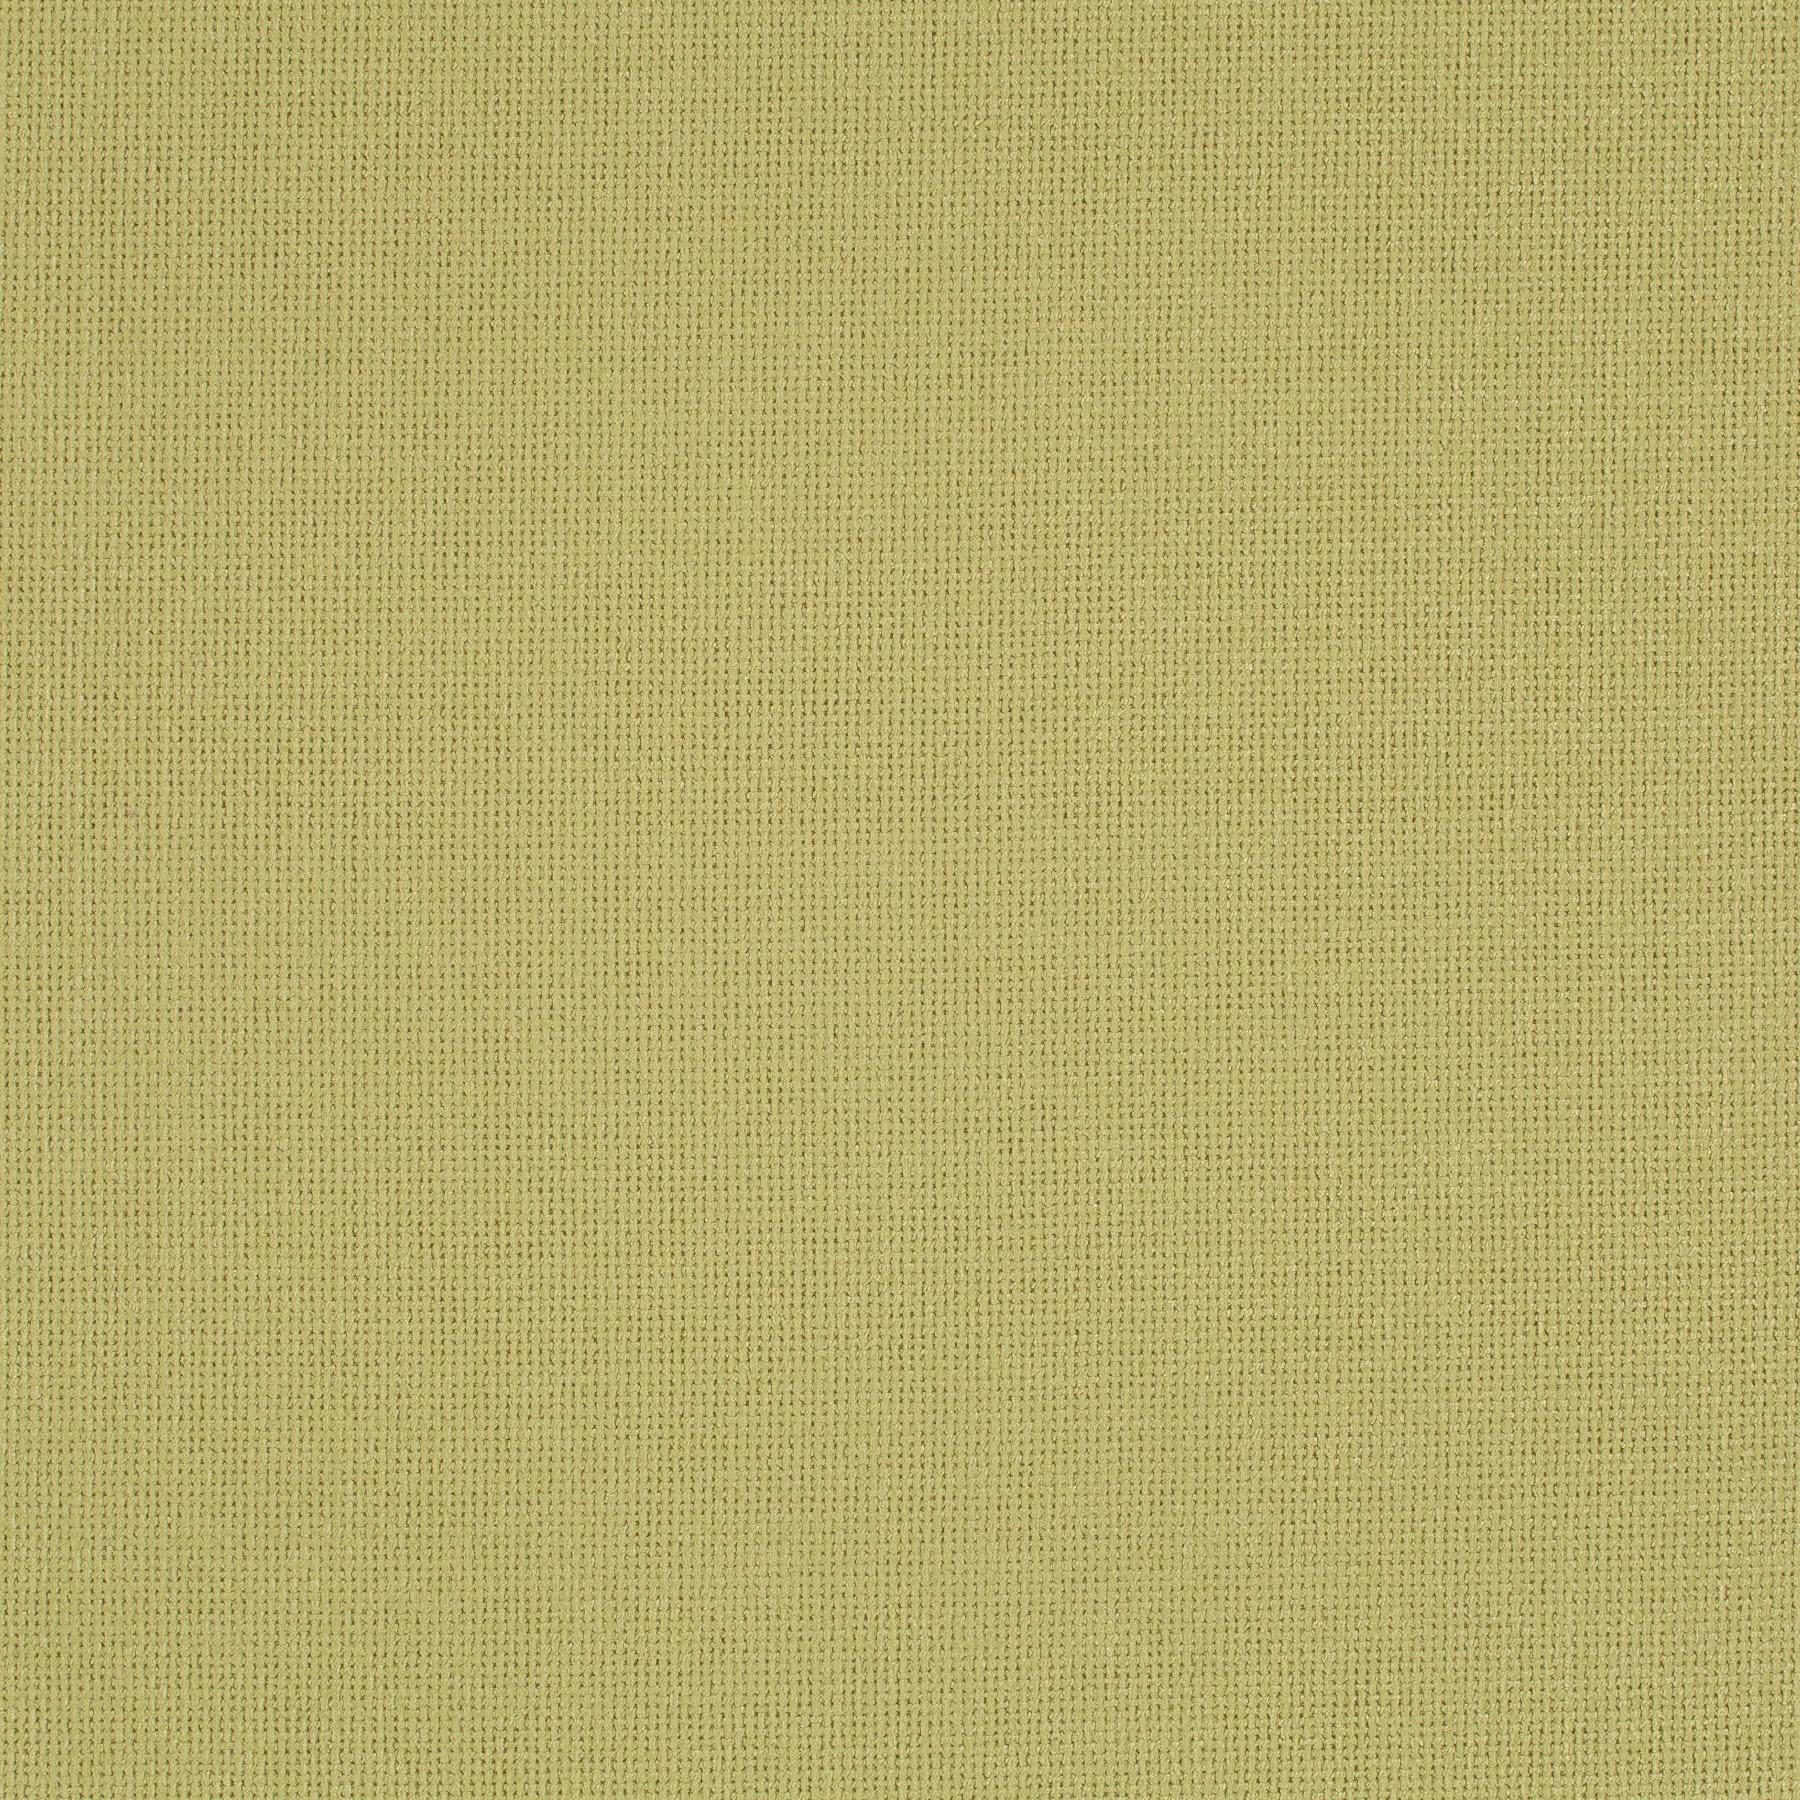 Upholstery Fabric Toro Vol 3 1 1243 031 Jab Anstoetz